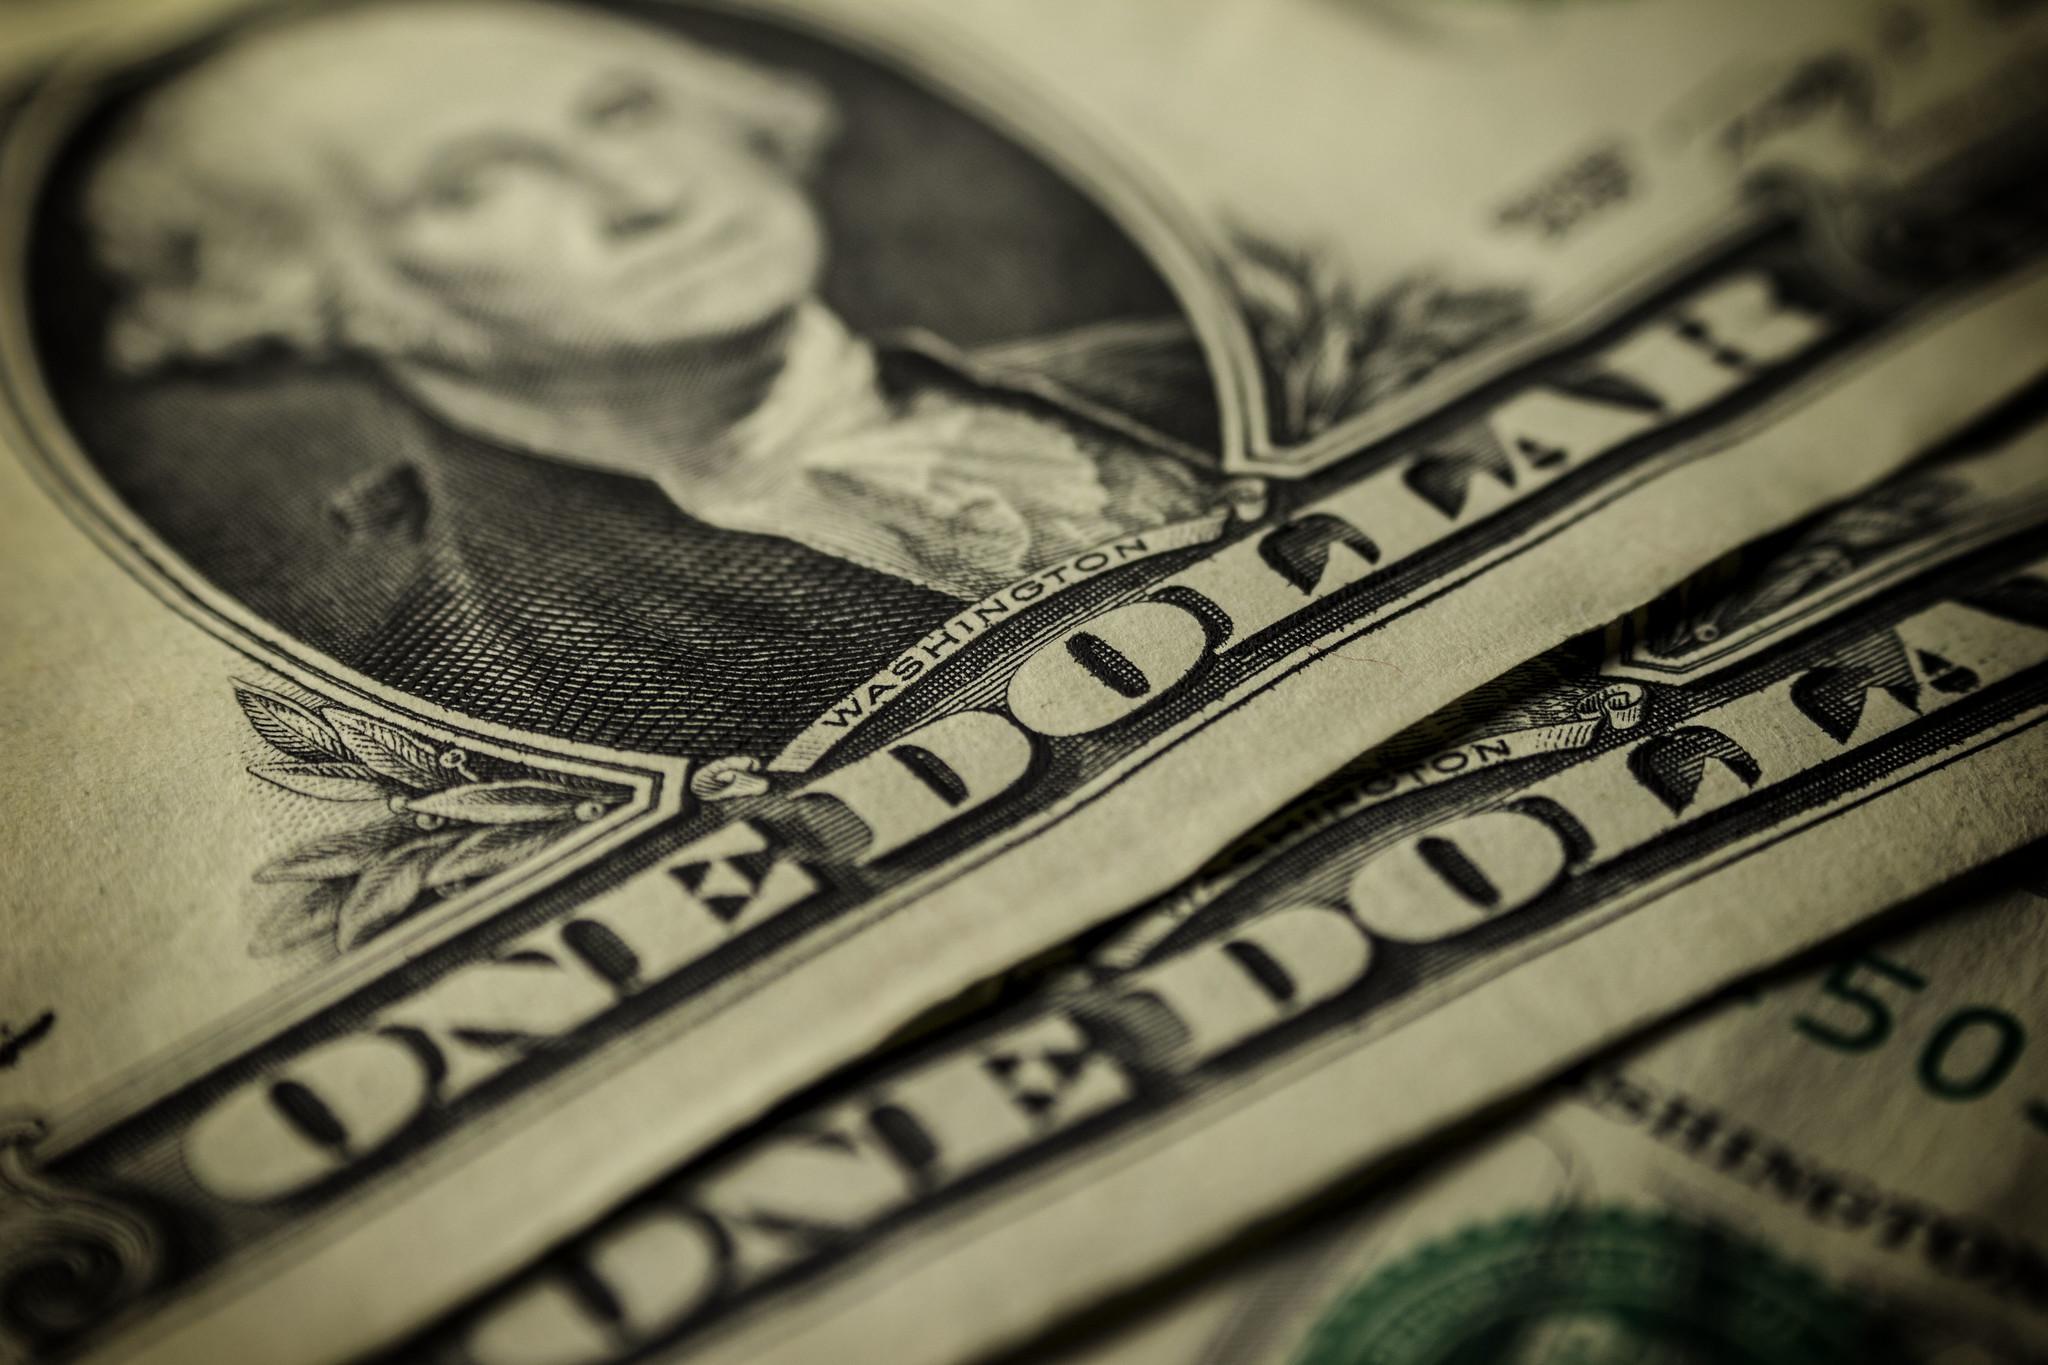 paquete de apoyos, estímulos, Fed, economía, Goldman Sachs empeora pronóstico para economía de EU